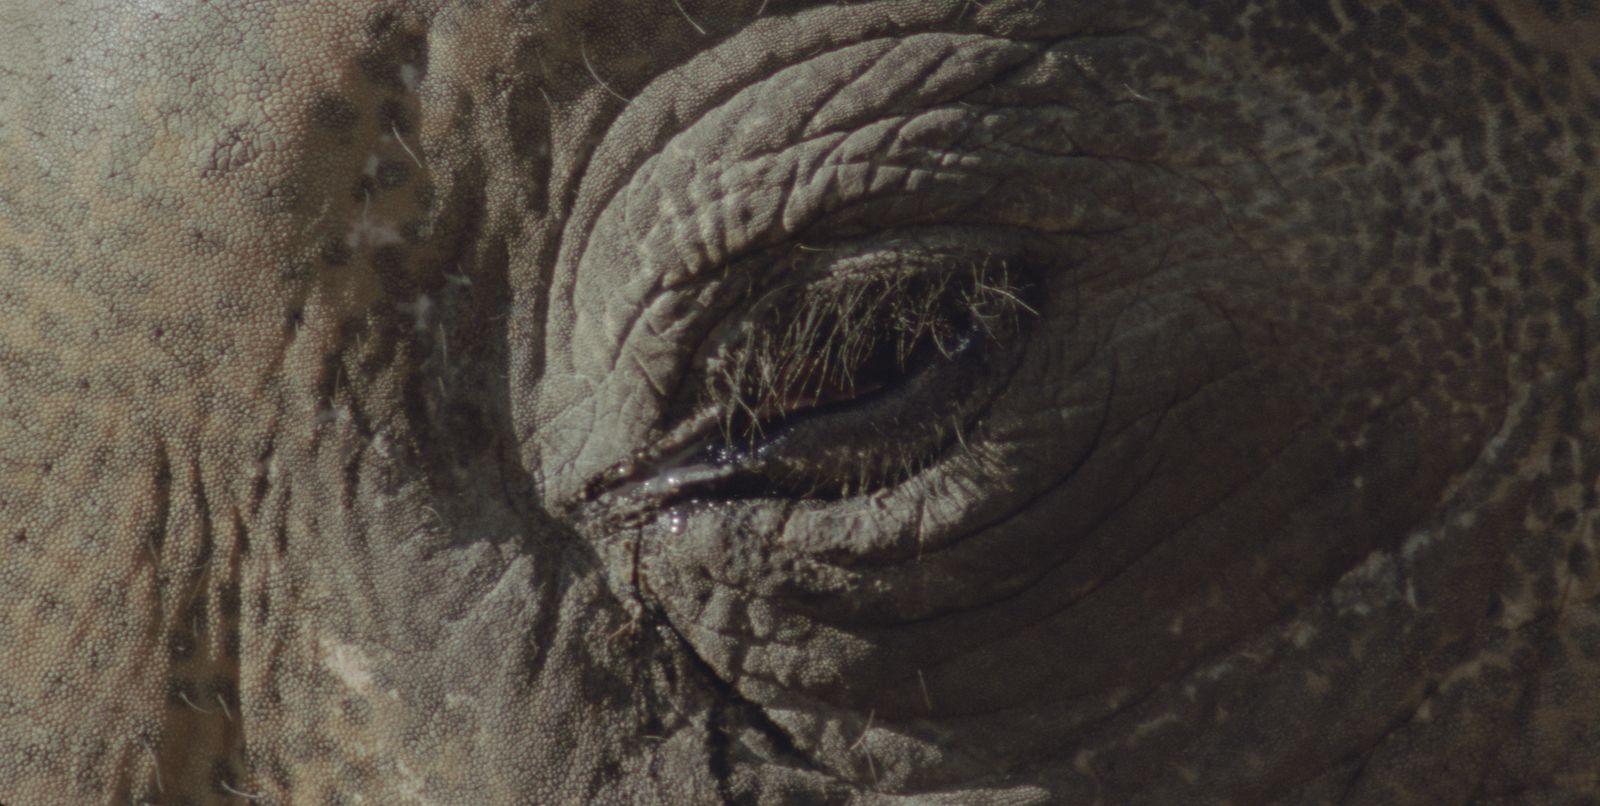 "'Het Grote Geheugen (The Big Memory)', 2008, (excerpt), 35 mm film loop, colour, aspect ratio 4:3; projector, loop system; added: ProRes 422 HQ, 25 fps, aspect ratio 16:9 (1920 x 1080 pixels), ca. 300 x 400 cm, 0'22"""